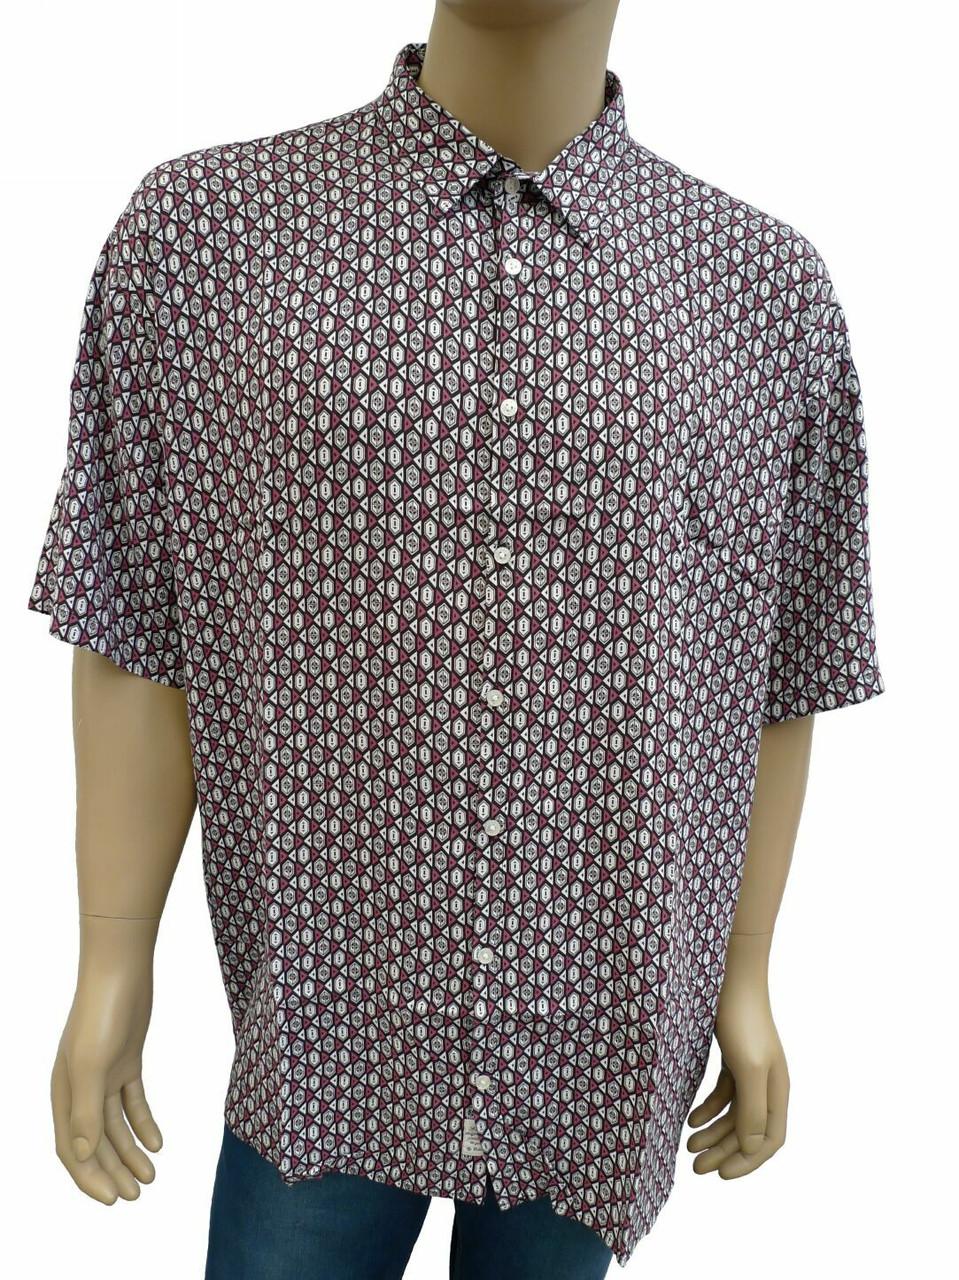 Рубашка мужская хлопок-бук-бамбук большой размер